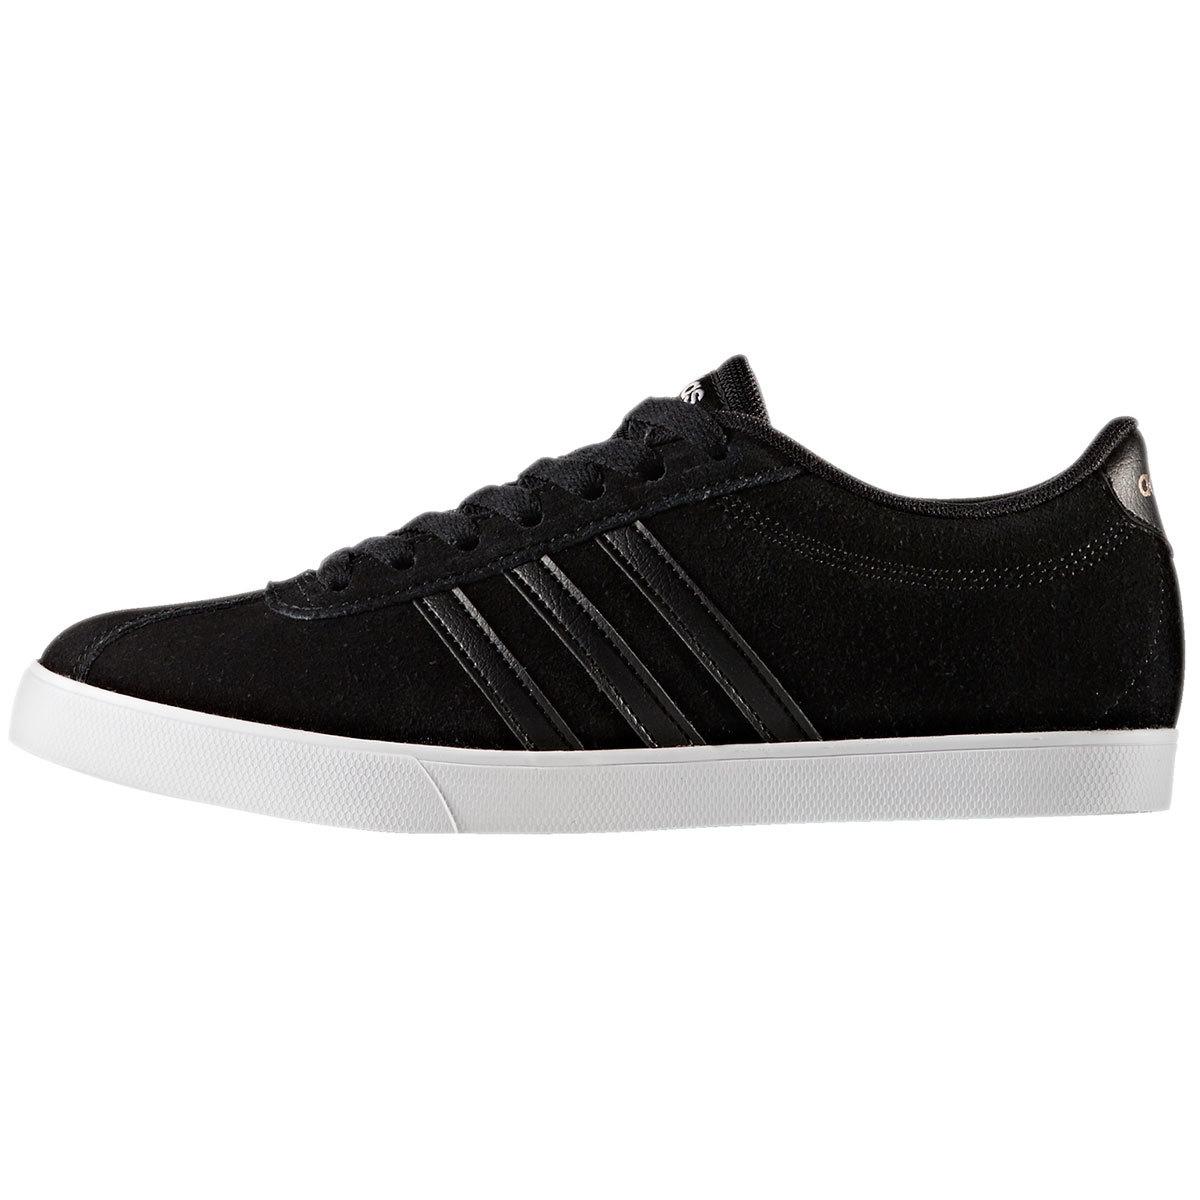 ADIDAS Women's Neo Courtset Sneakers